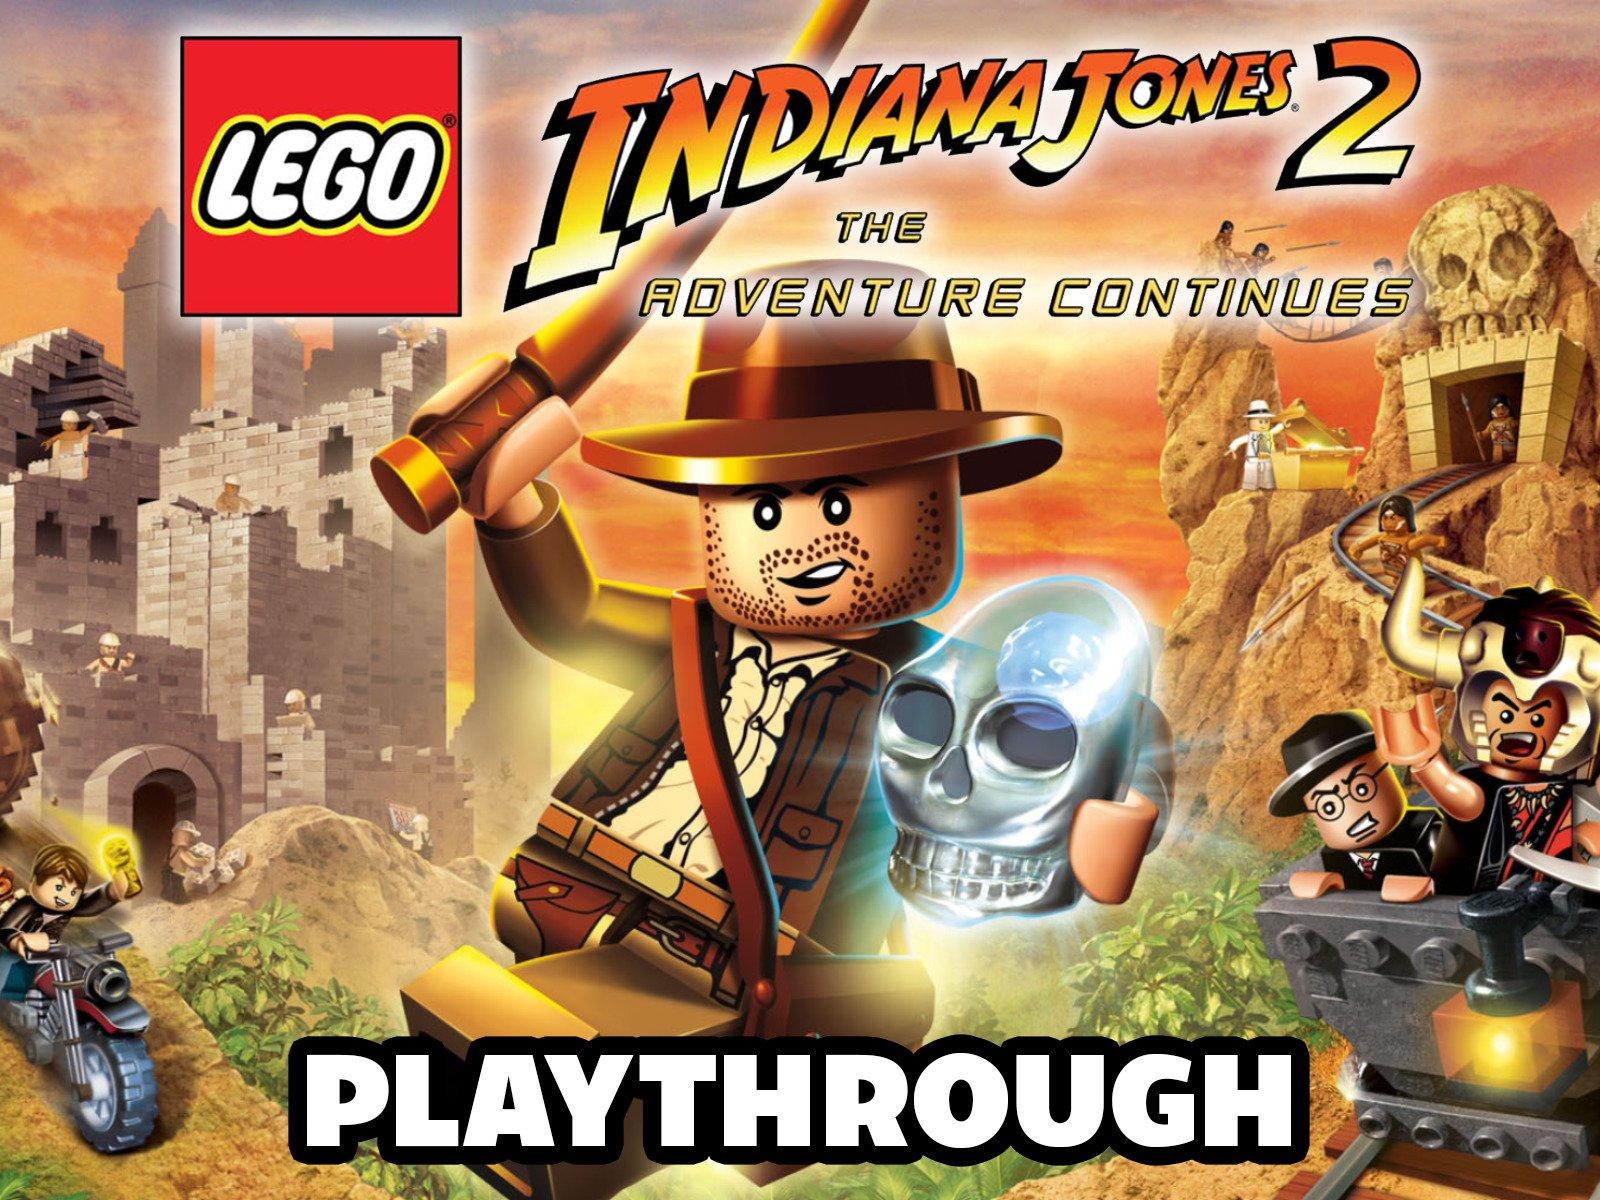 Clip: Lego Indiana Jones 2 The Adventure Continues Playthrough - Season 1